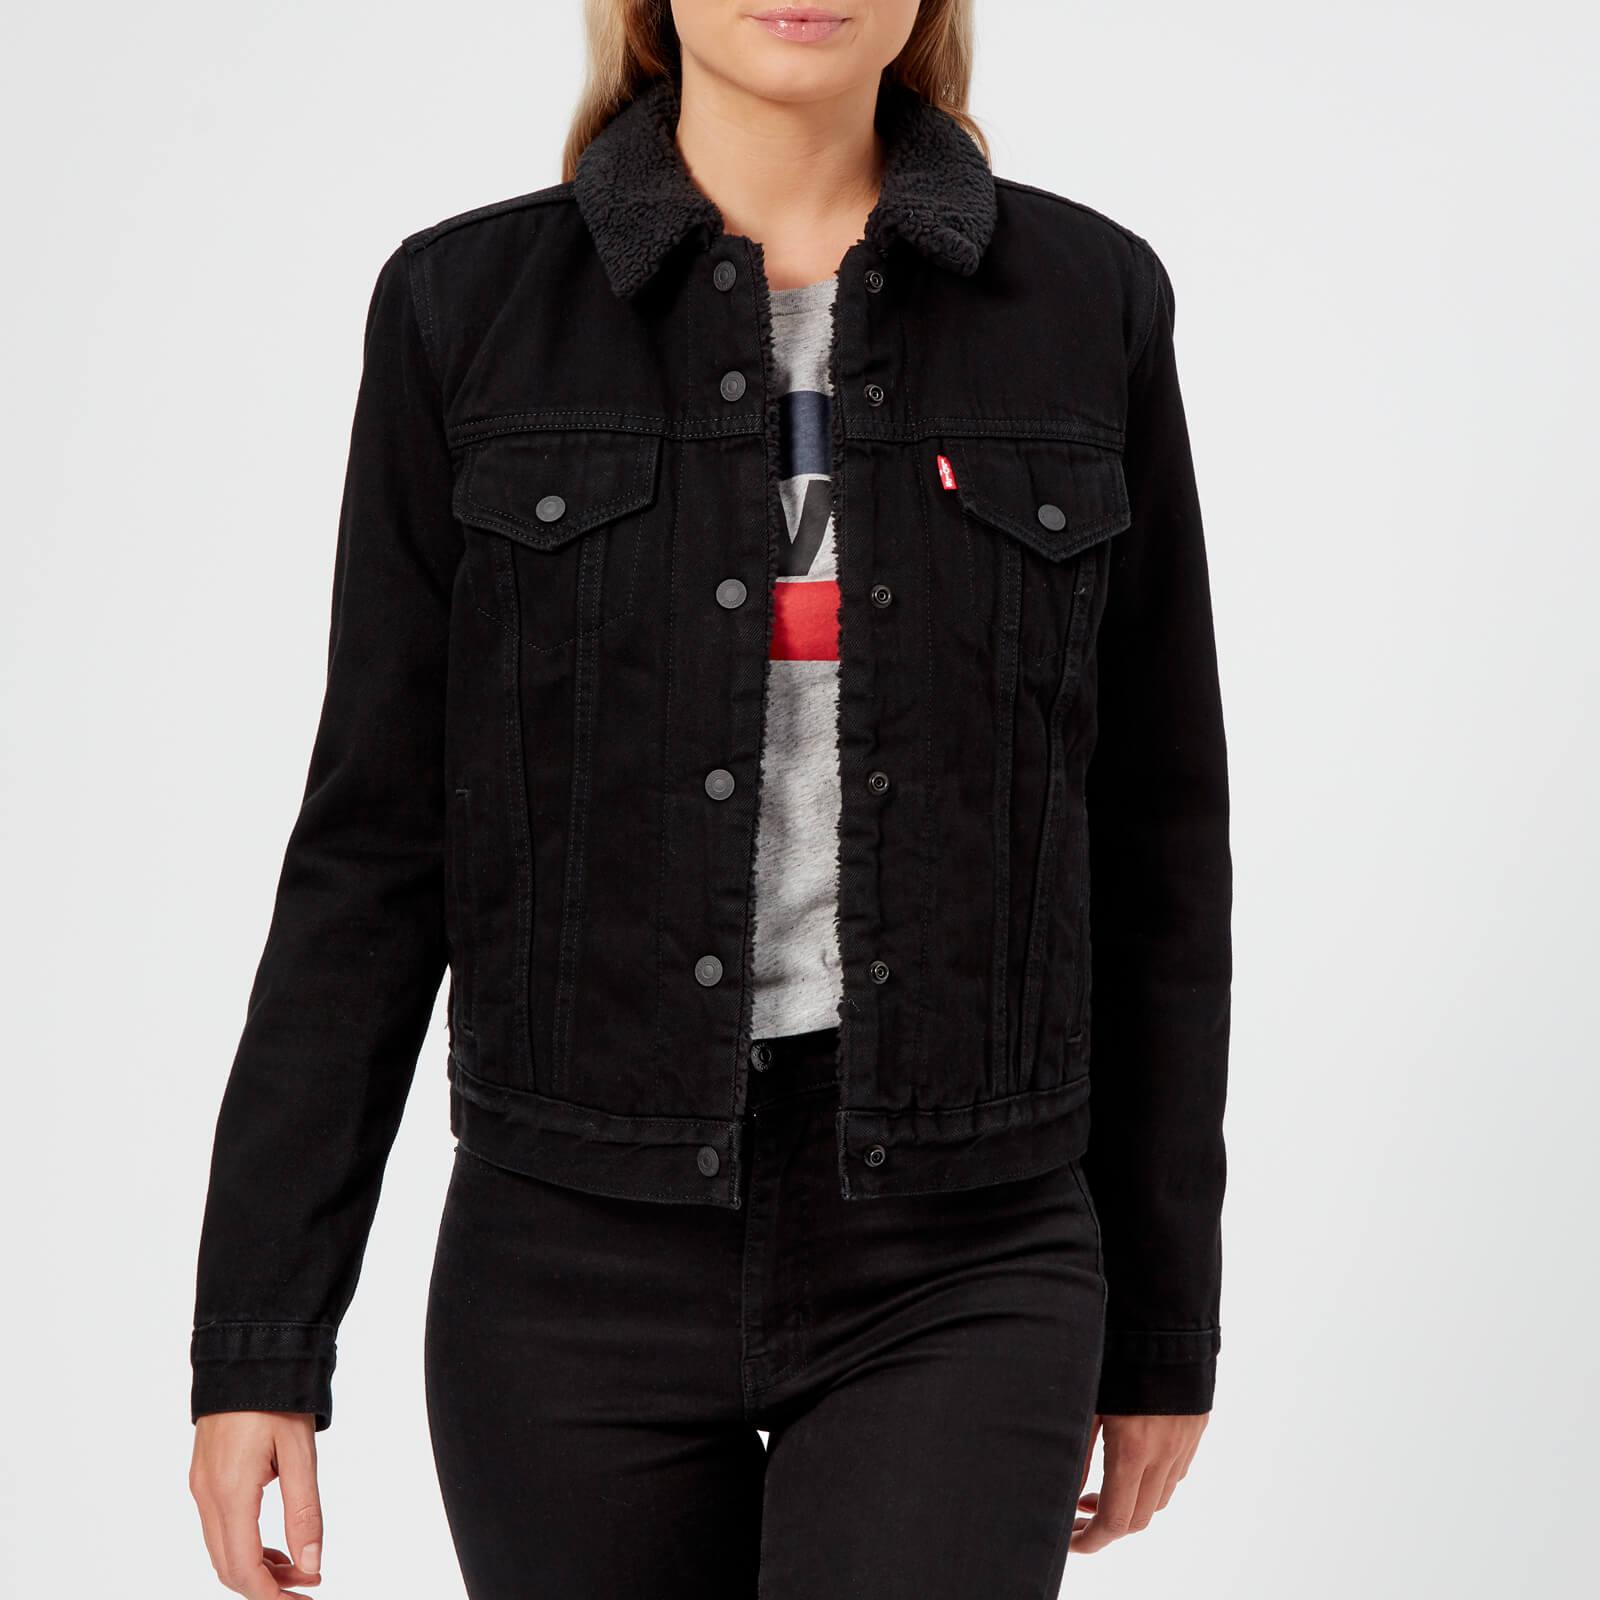 334492742103 Levi's Women's Original Sherpa Trucker Jacket - Black Womens Clothing |  TheHut.com